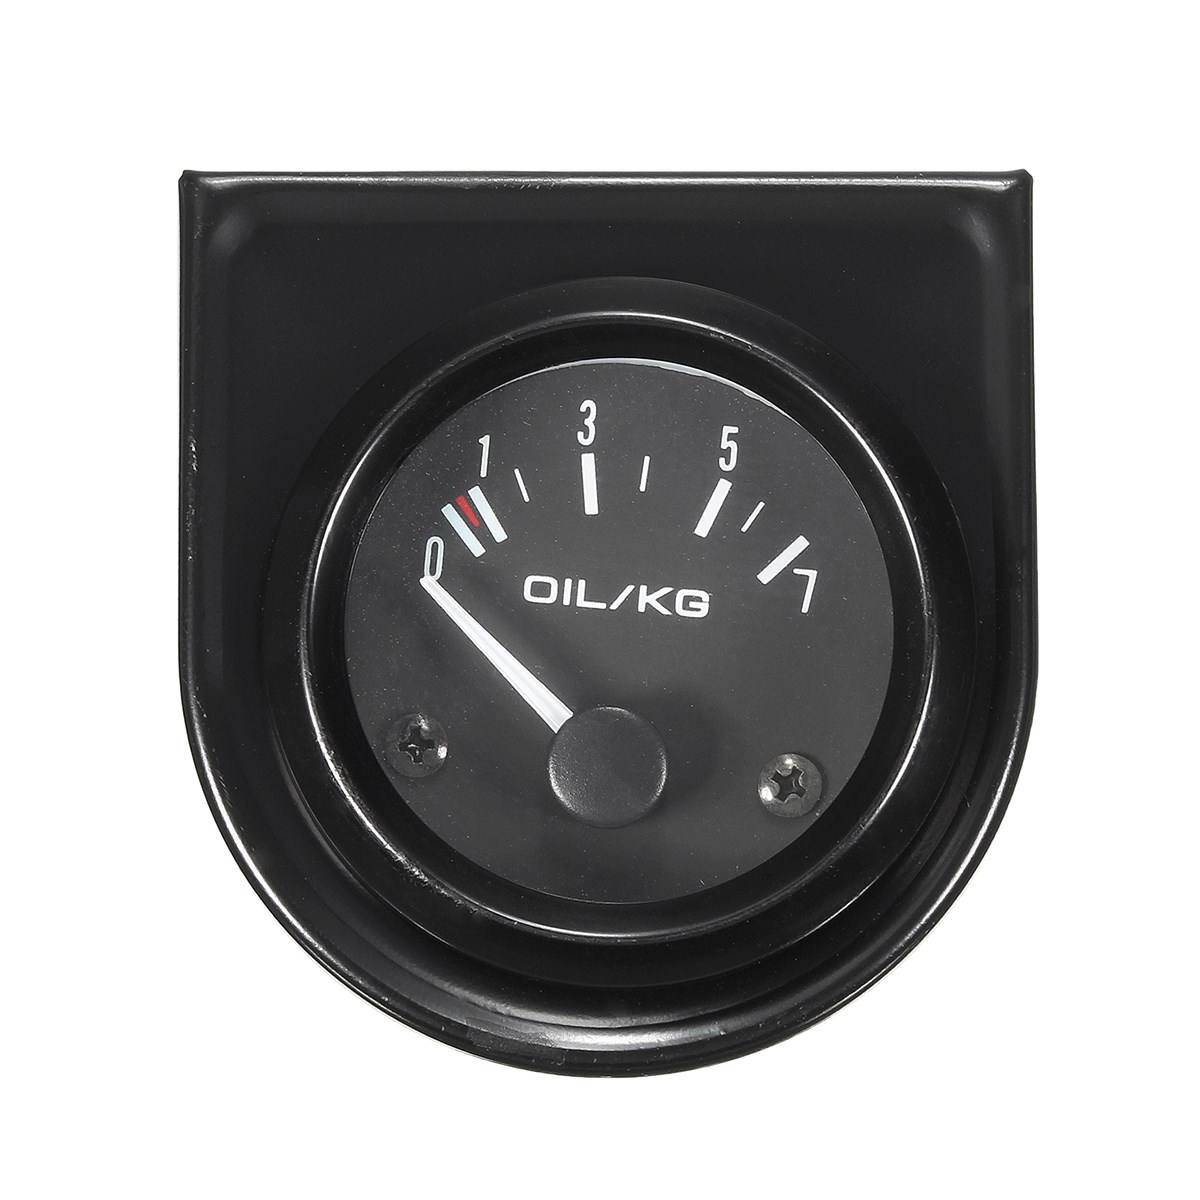 Aliexpress Com Buy Zuk Brand New Transmission Oil: 2016 Brand New 2 Inch 52mm Universal Car Black Dials Oil